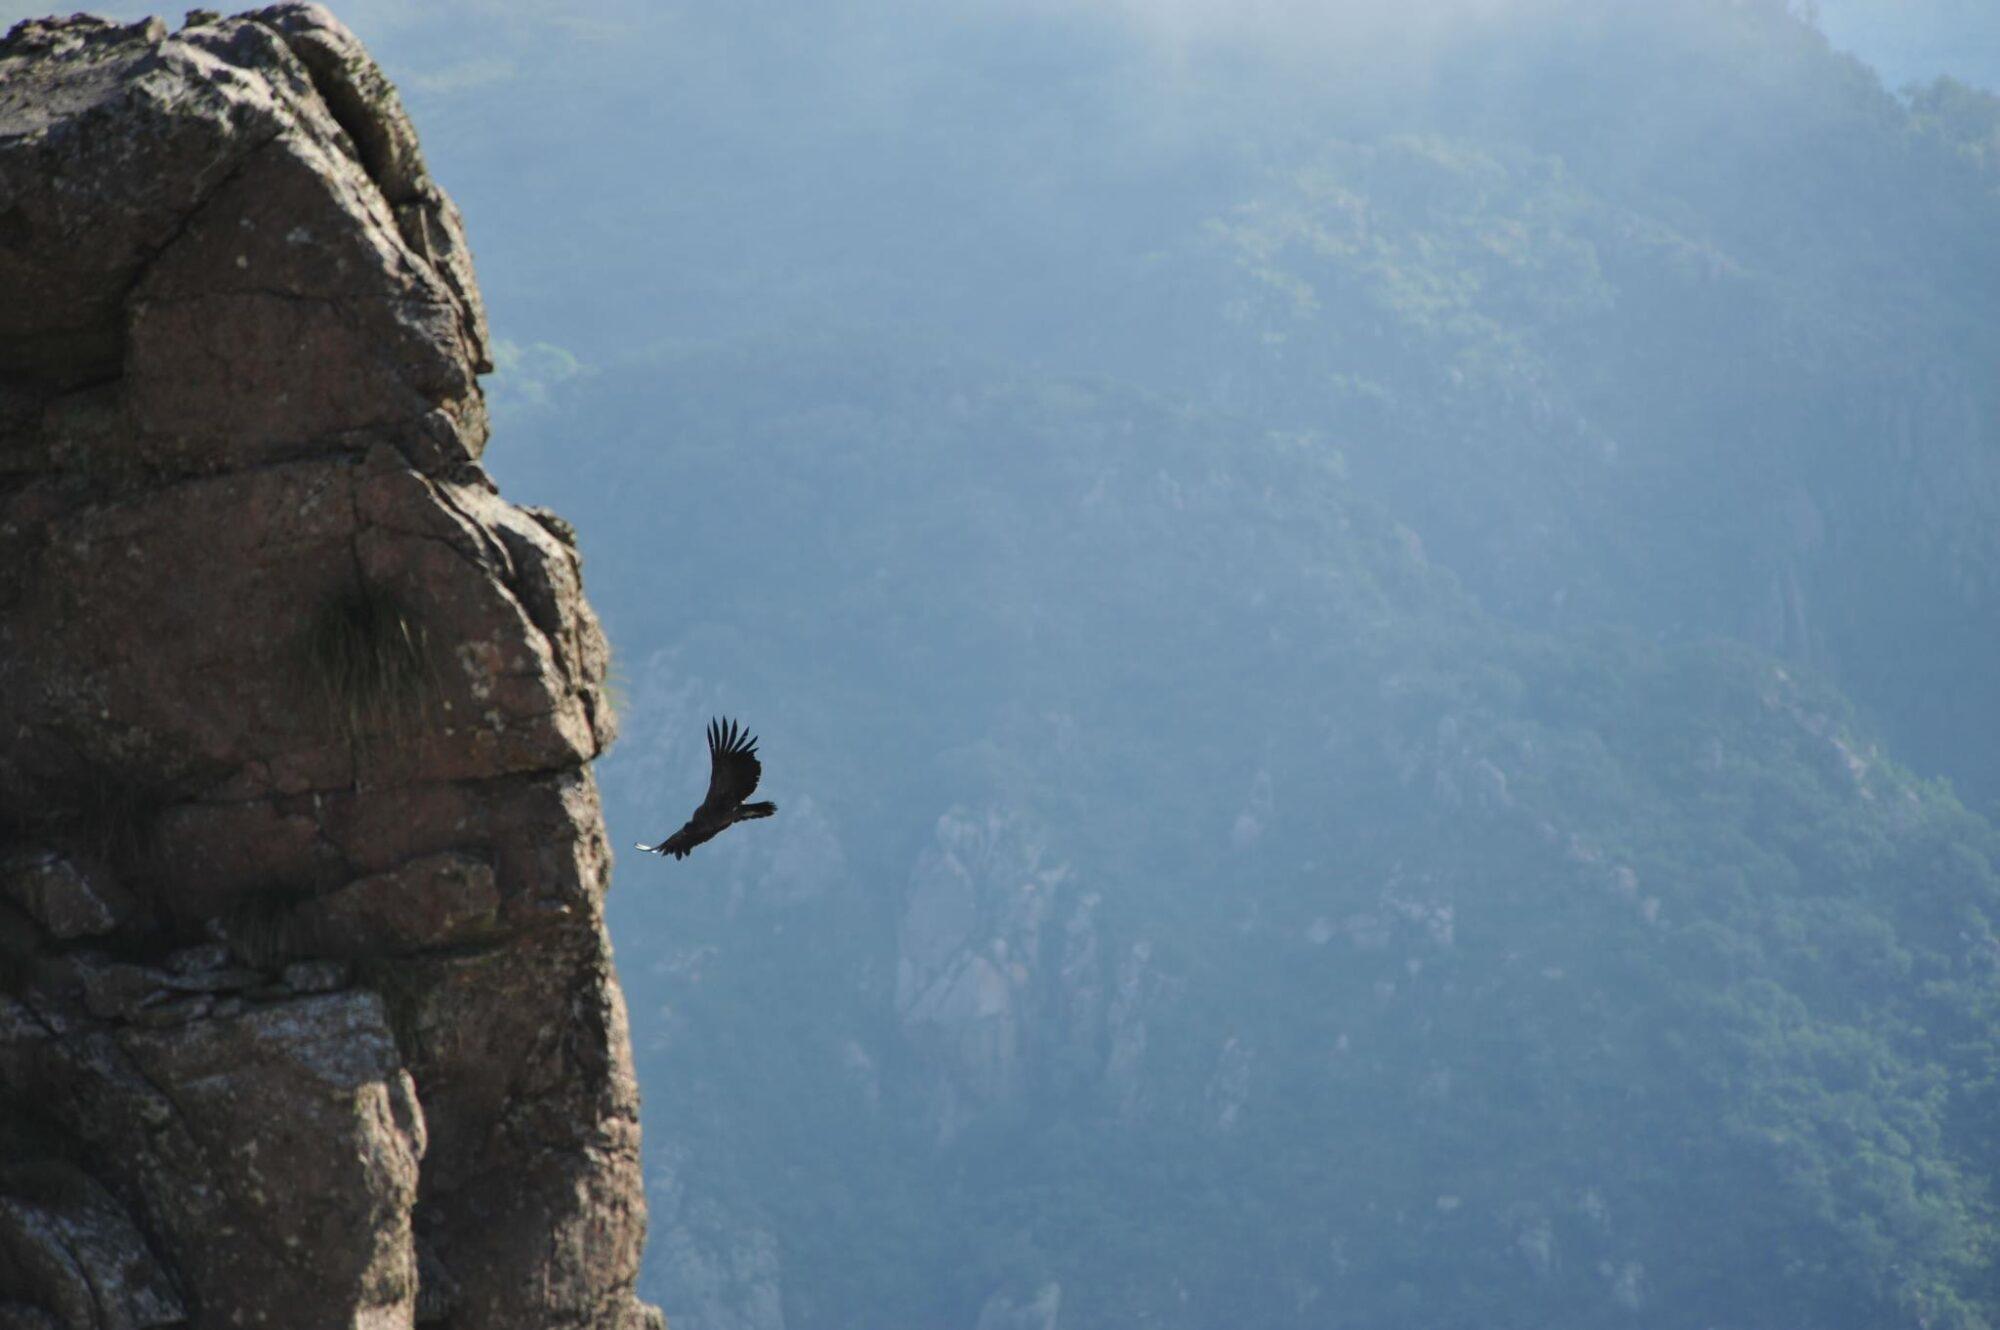 quebrada del condor la rioja argentina avvistamento